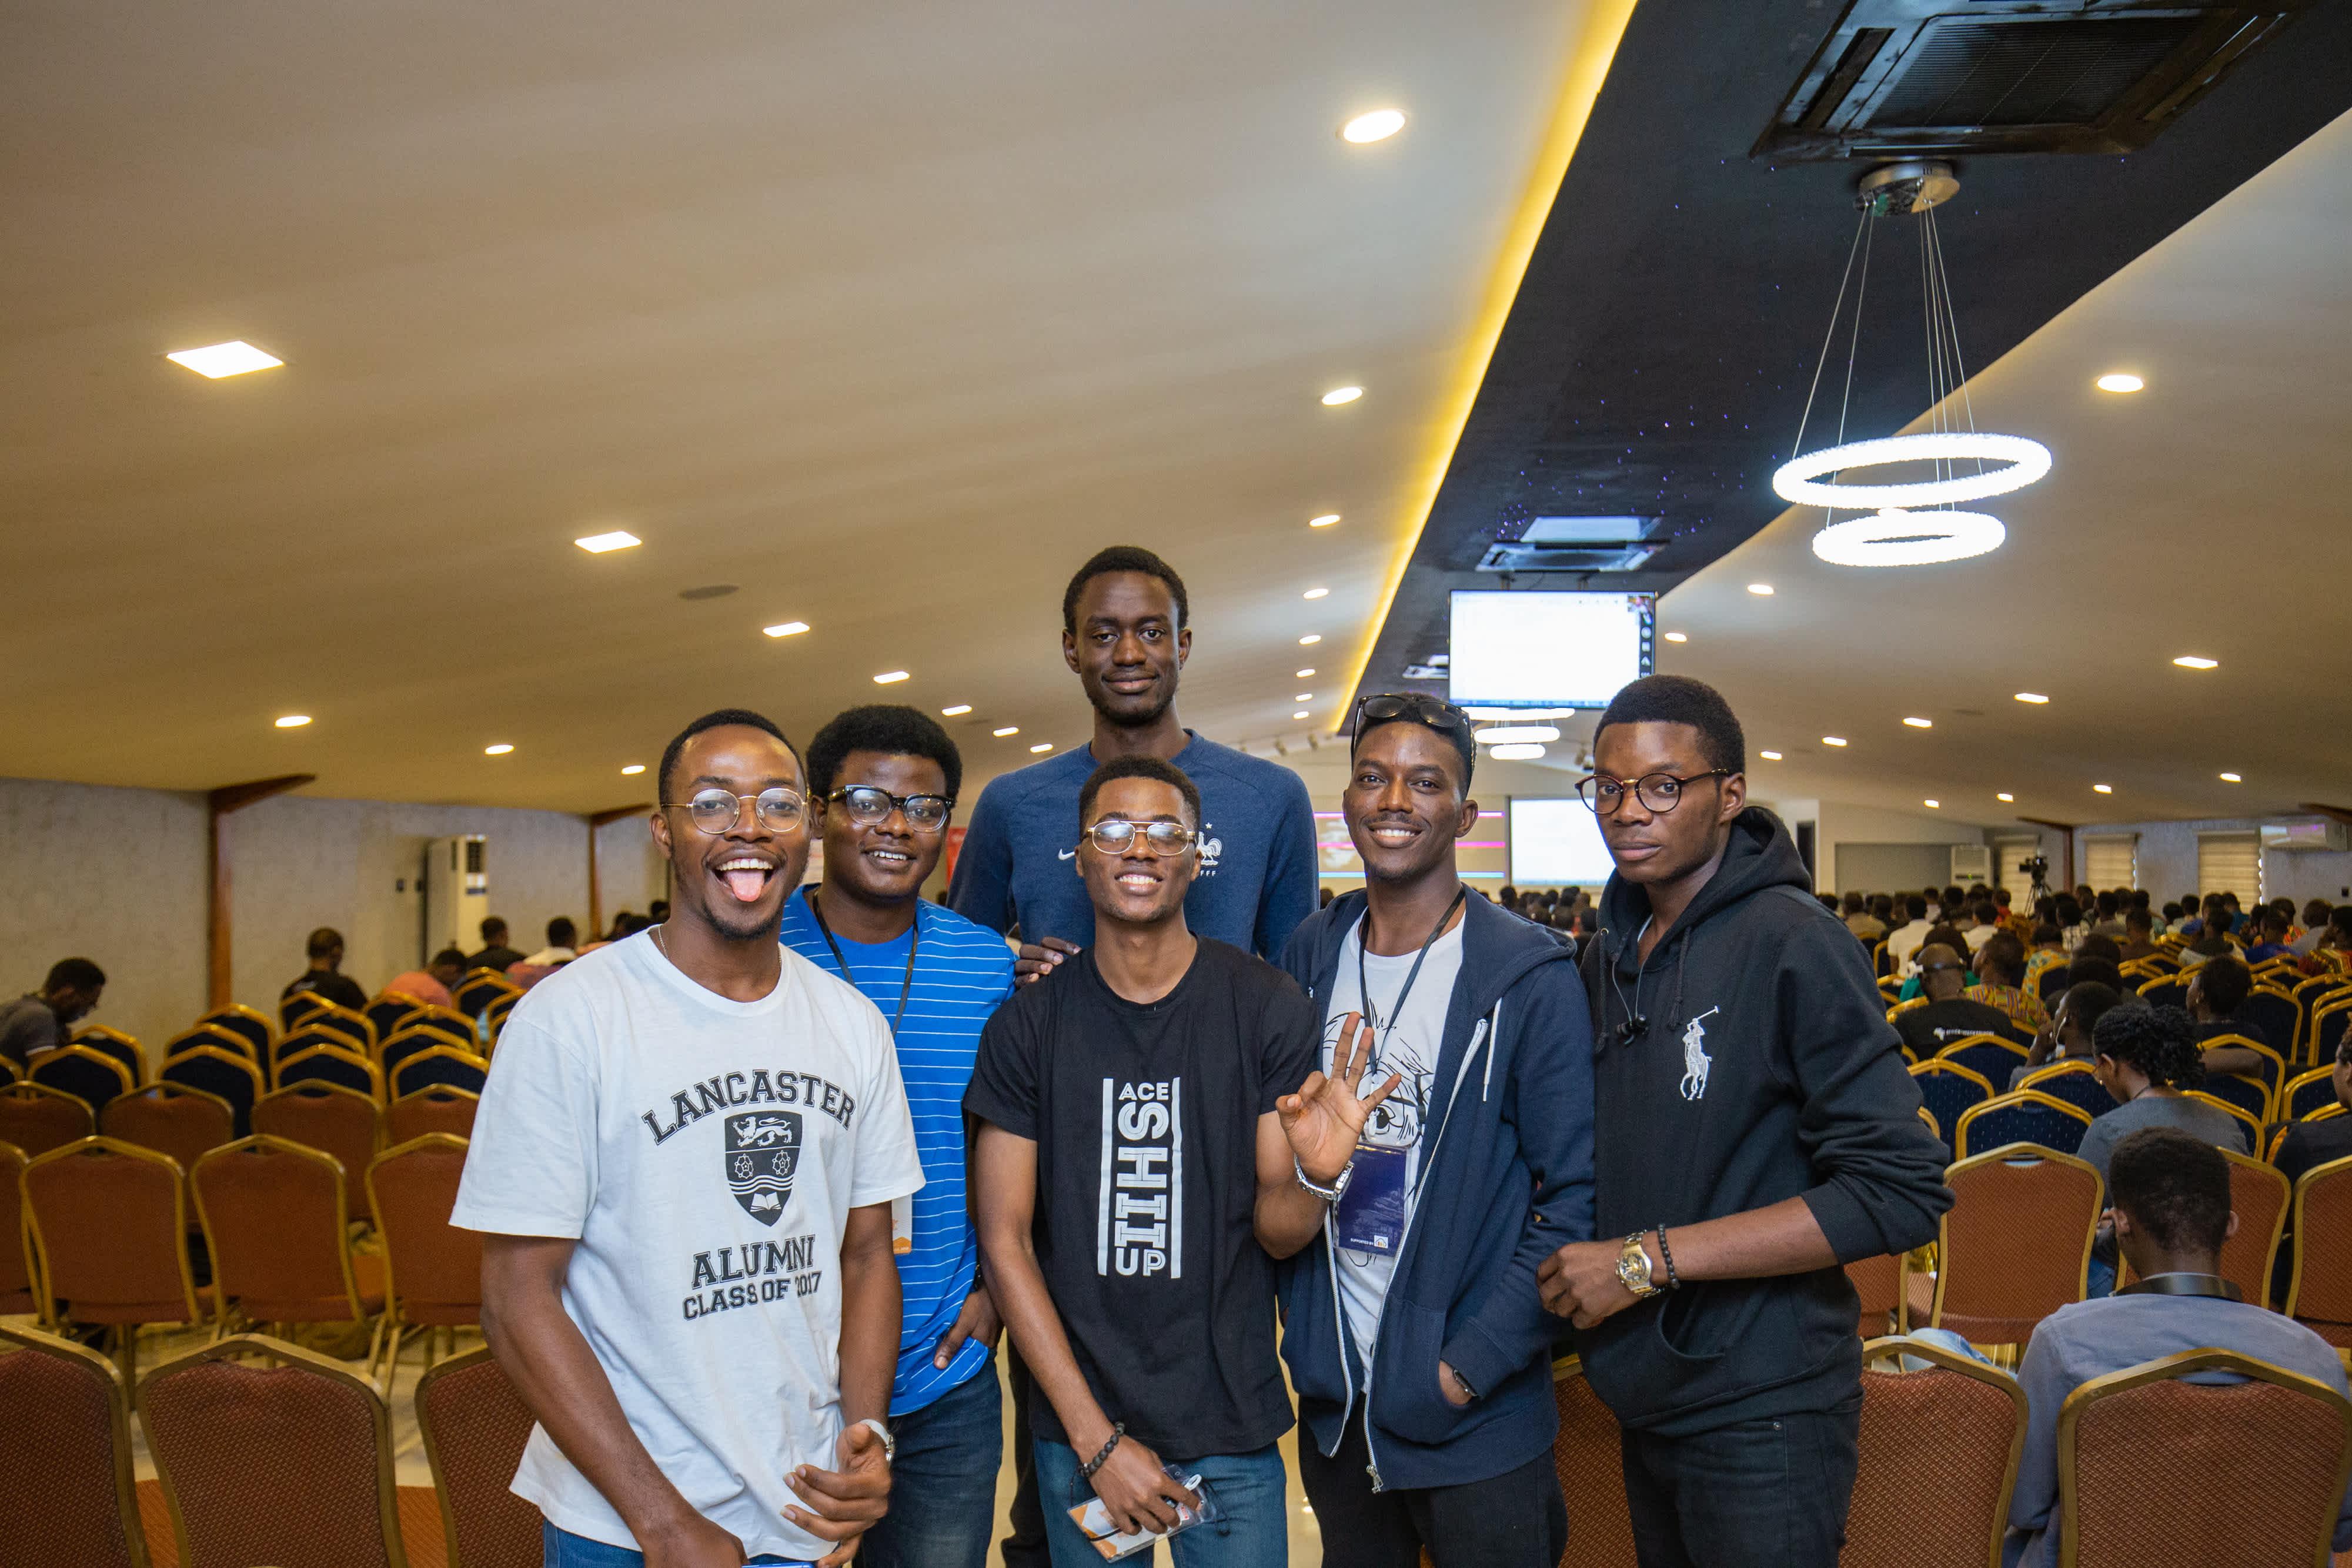 Benjamin, Acekyd, Solomon Osadolo, Momoh Silm, Neo Ighodaro, JayKay